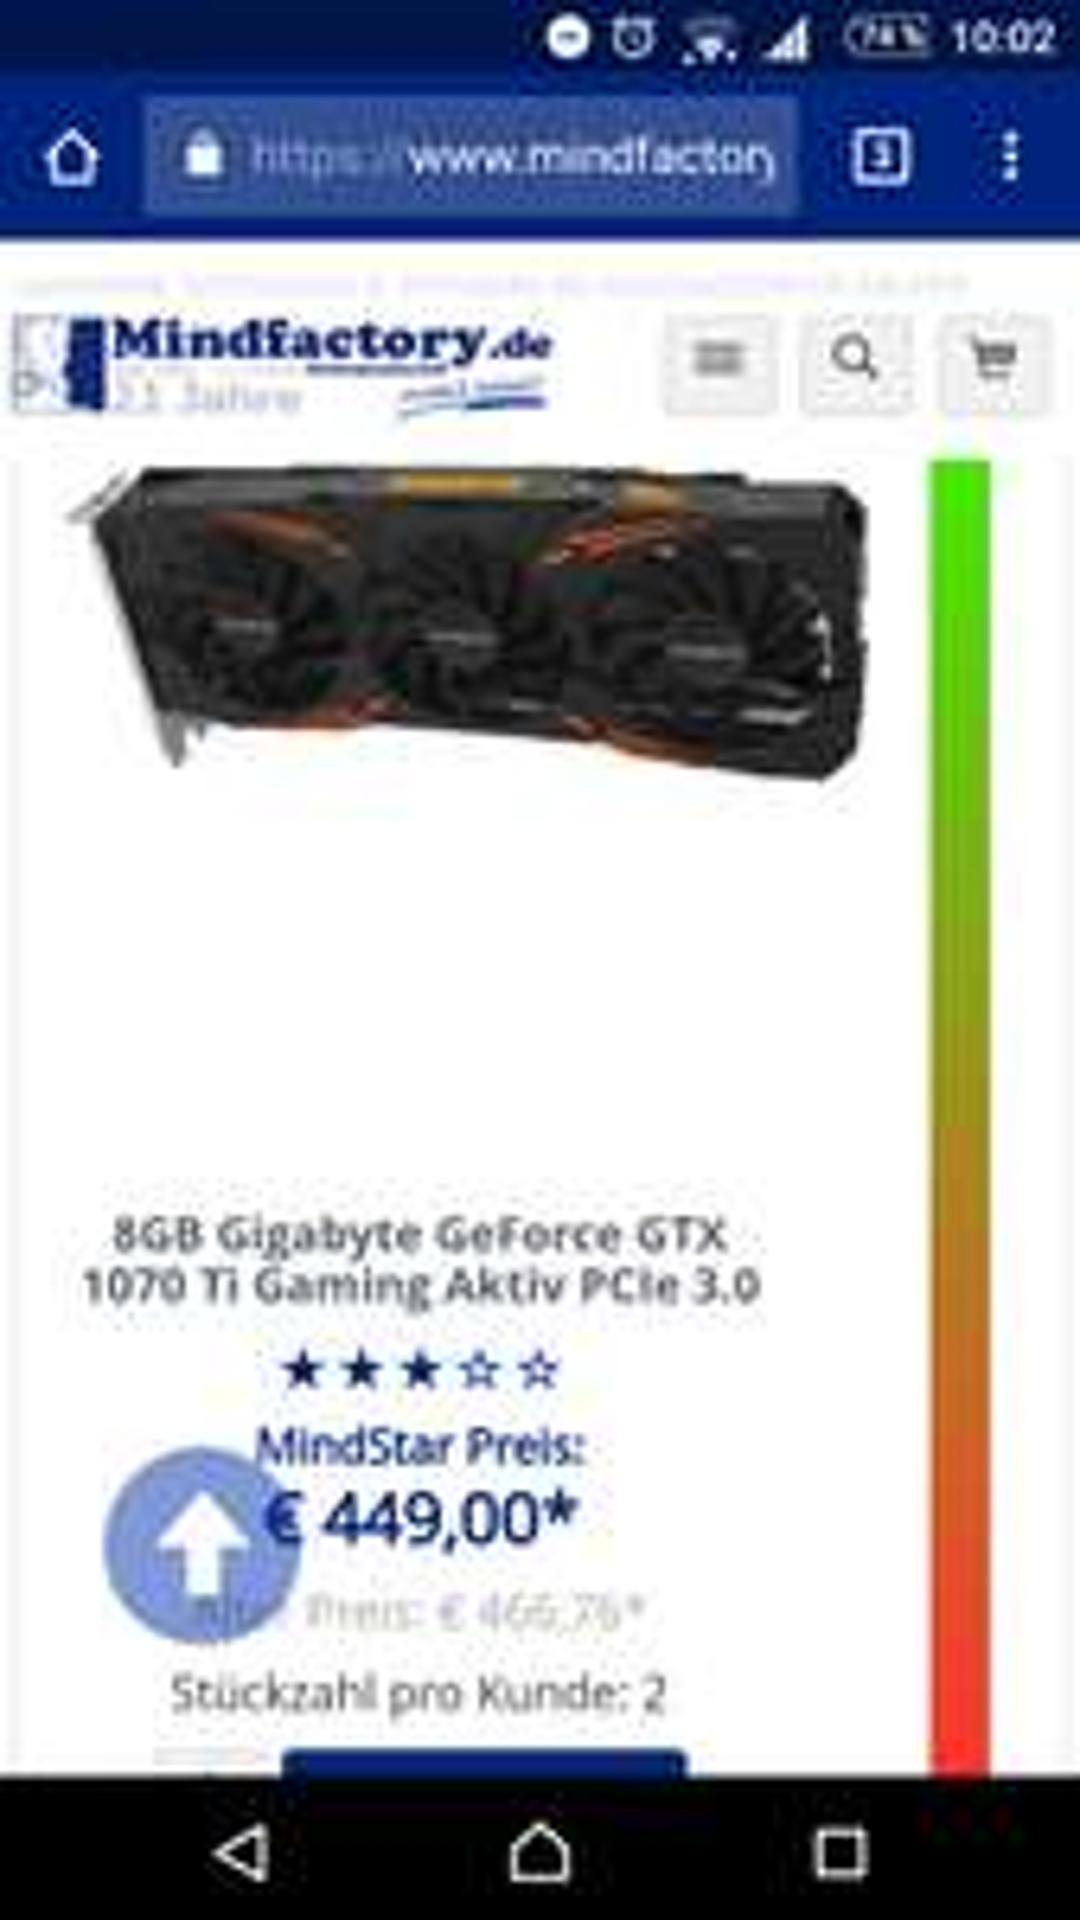 [Mindfactory]Gigabyte gtx 1070ti Gaming 8gb